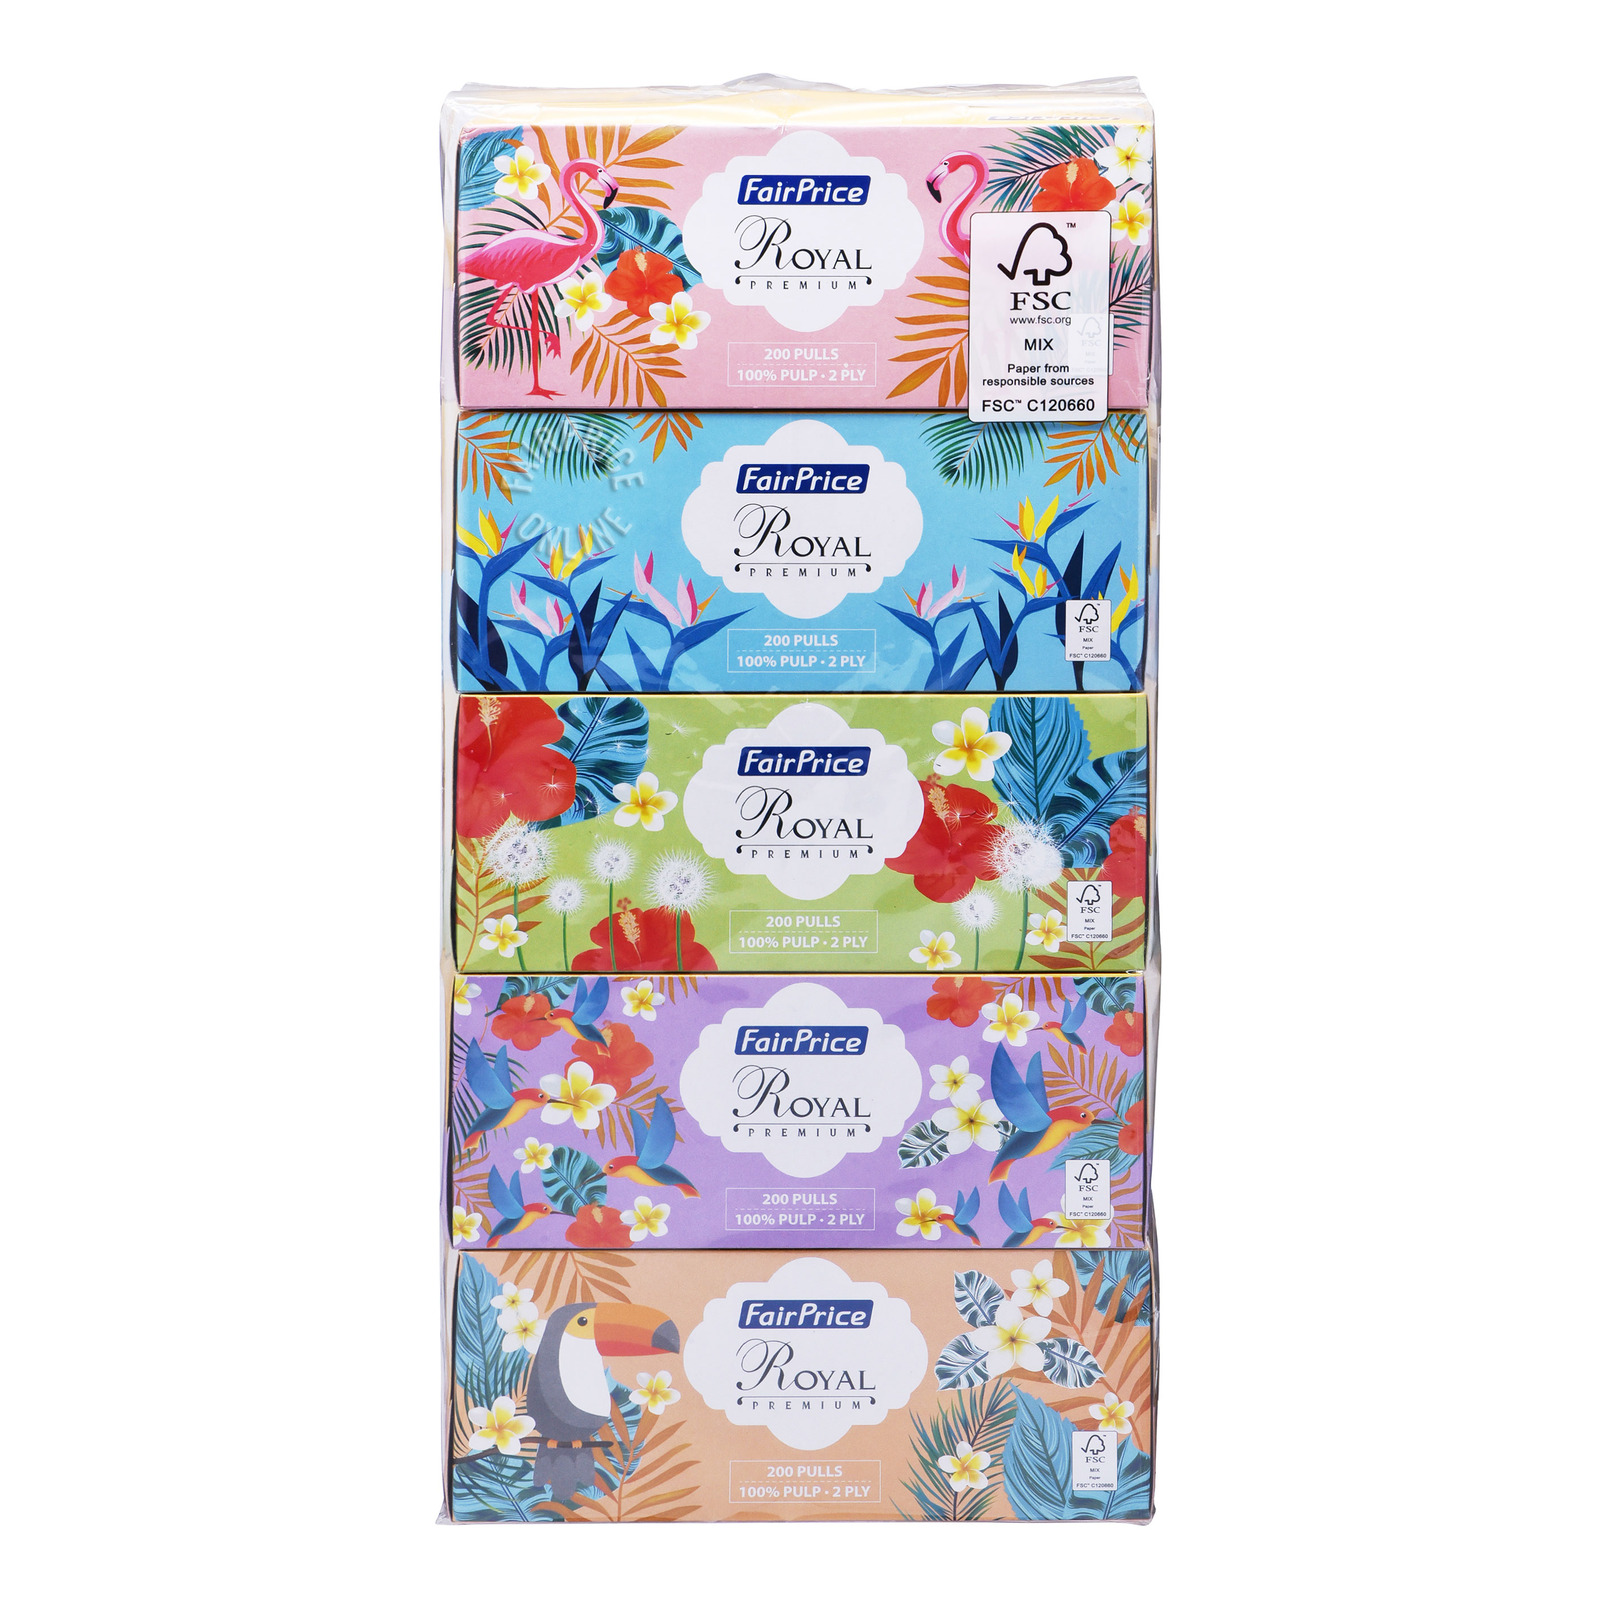 FairPrice Royal Premium Facial Tissue